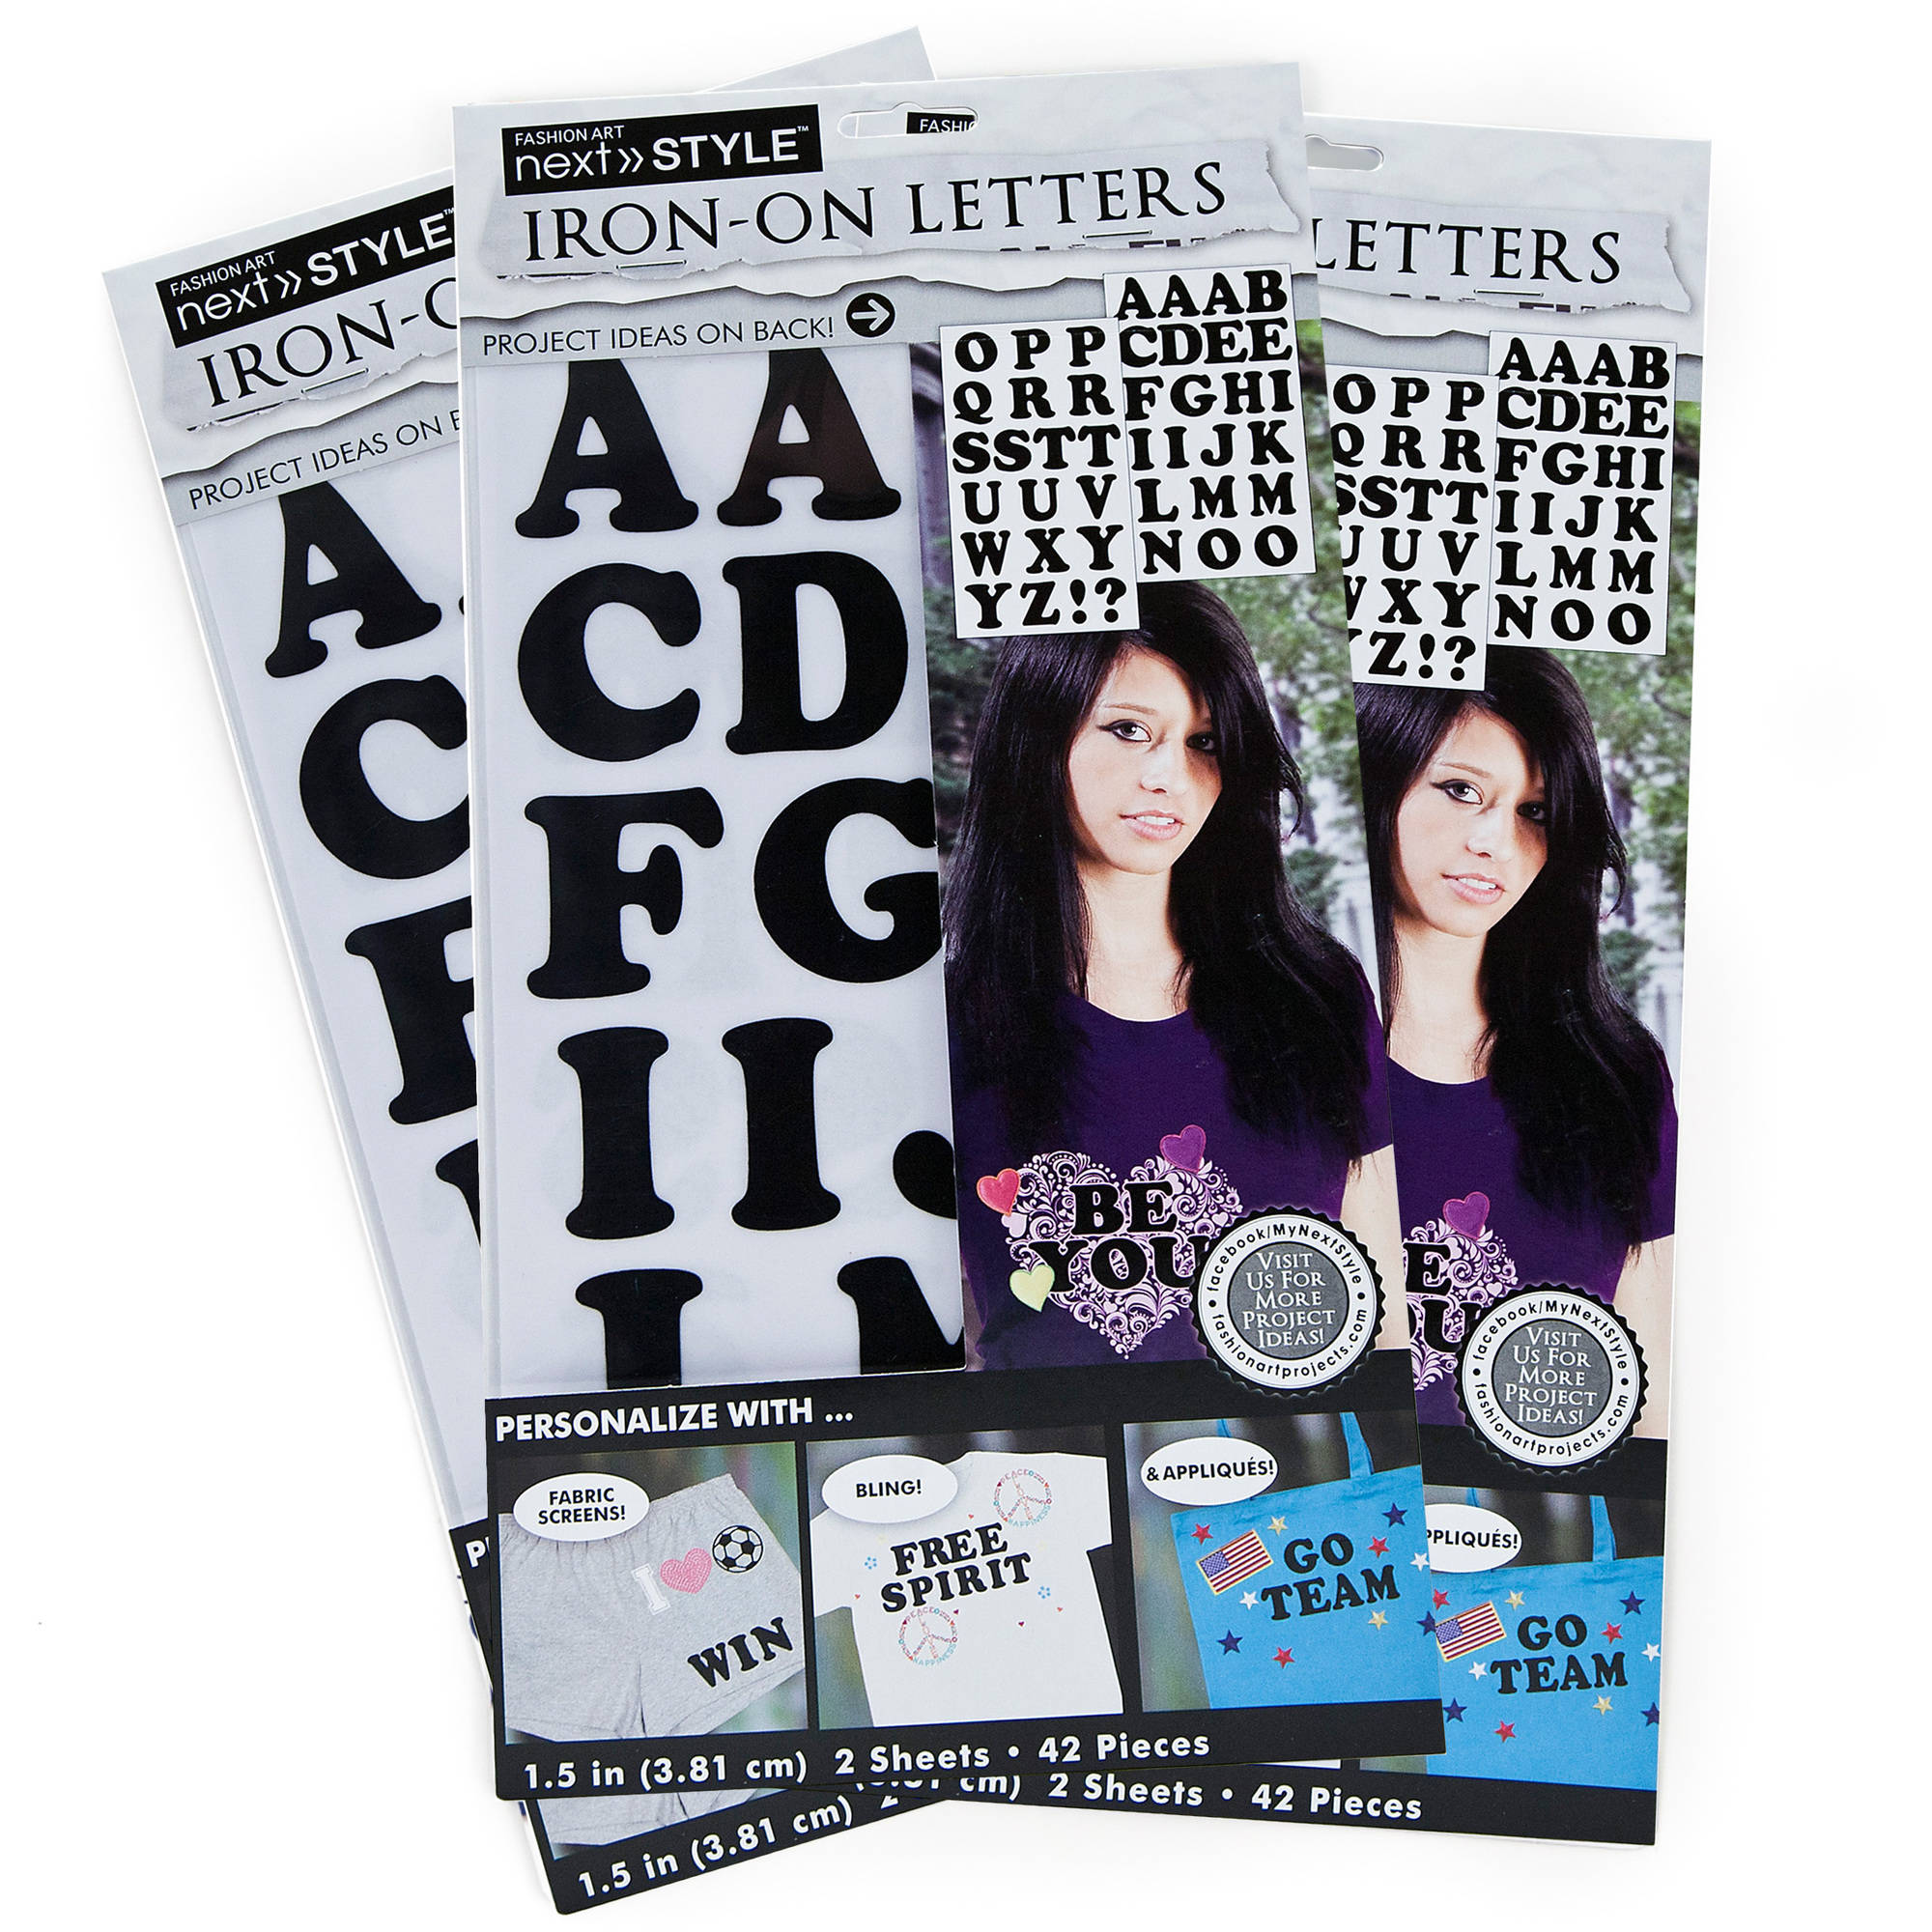 "Next Style 1.5"" Black Iron-On Letters, KE Style, 3pk by Horizon Group USA"